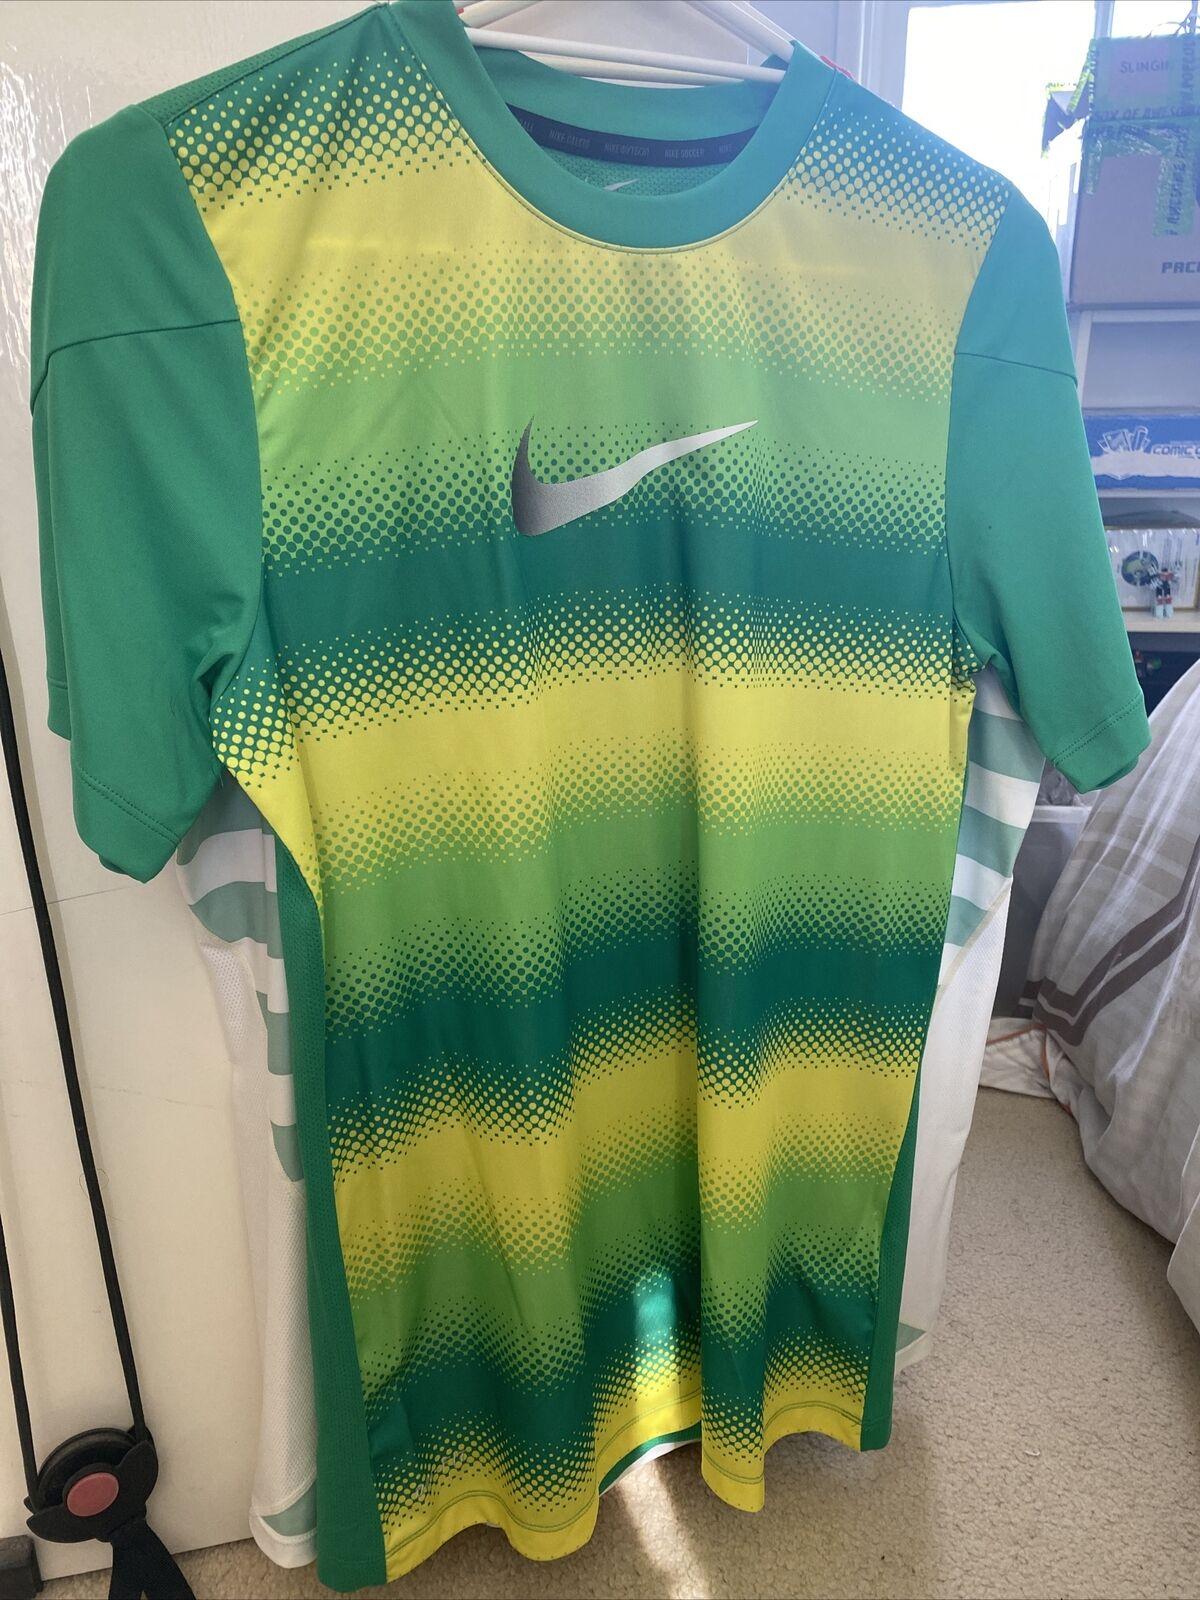 Men's Nike Football Green & Yellow Training Shirt Size M Medium Preowned Soccer